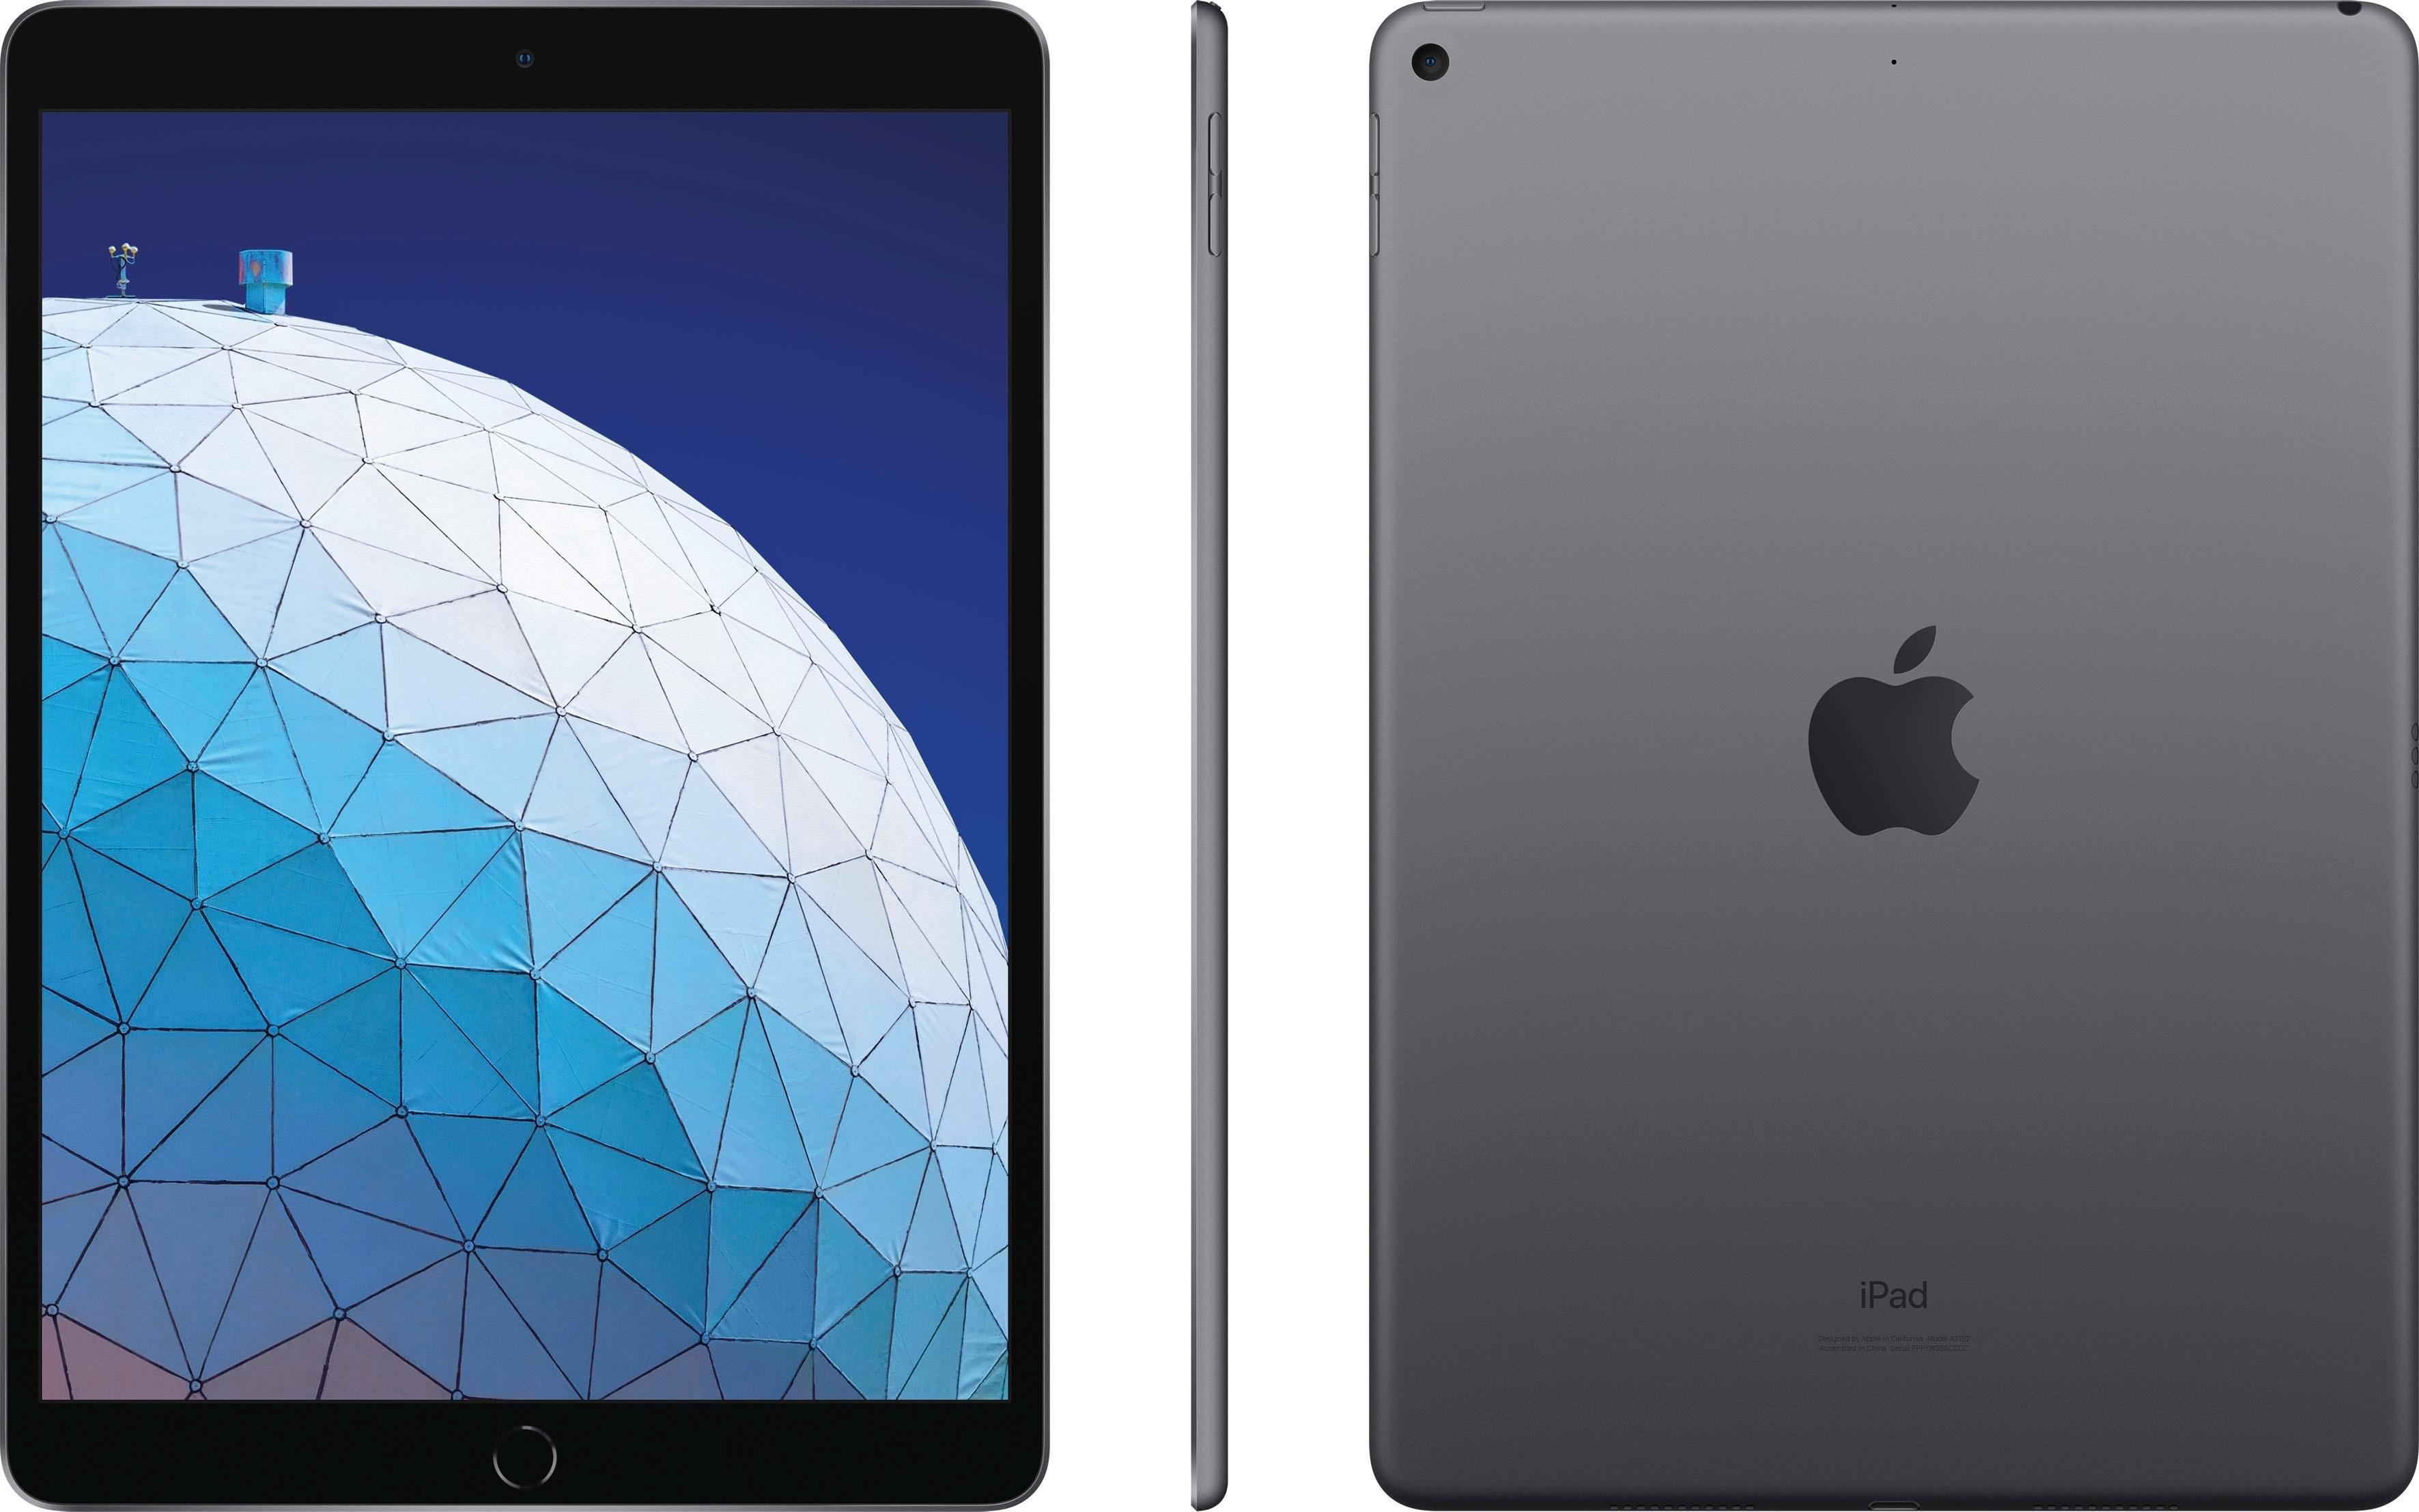 Apple »iPad Air - 64GB - wifi + cellular« tablet (10,5'', 64 GB, iOS, 4G (LTE)) - verschillende betaalmethodes